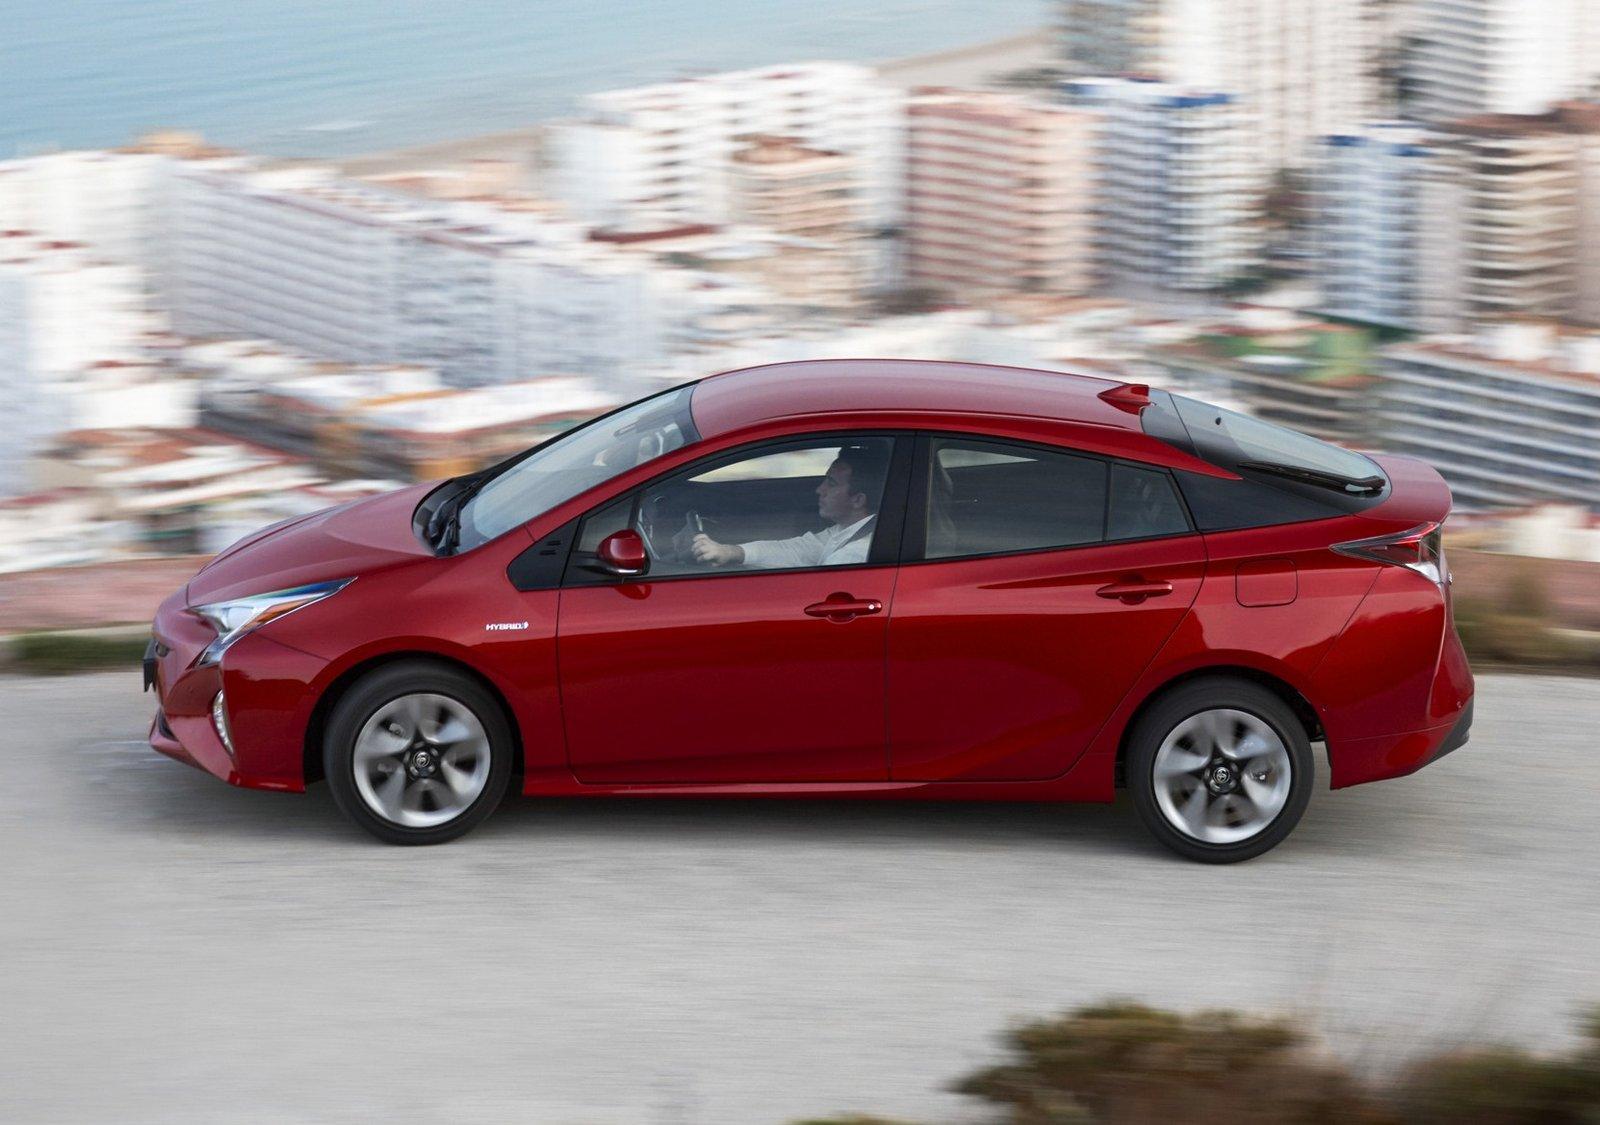 Coches híbridos con menos consumo. Toyota Prius